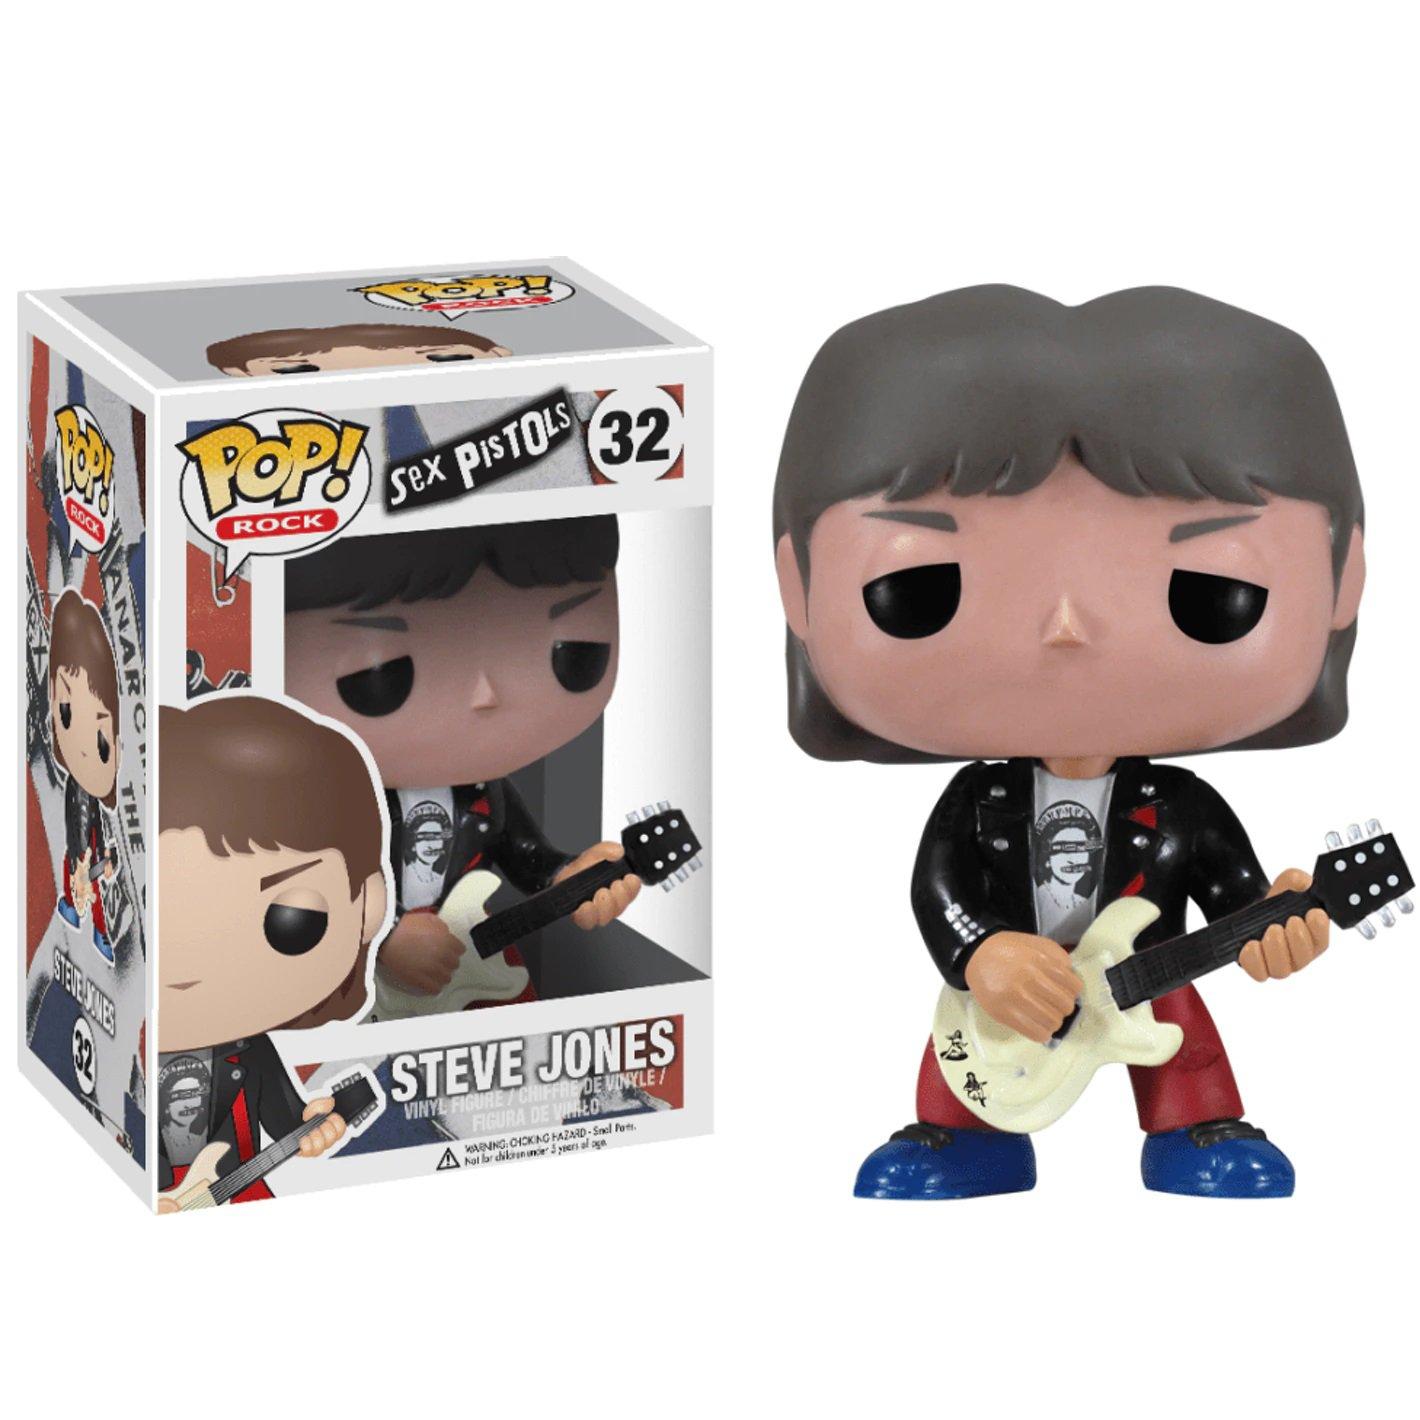 Steve Jones Sex Pistols �32 Punk Rock Music Funko POP! Action Figure Vinyl PVC Toy